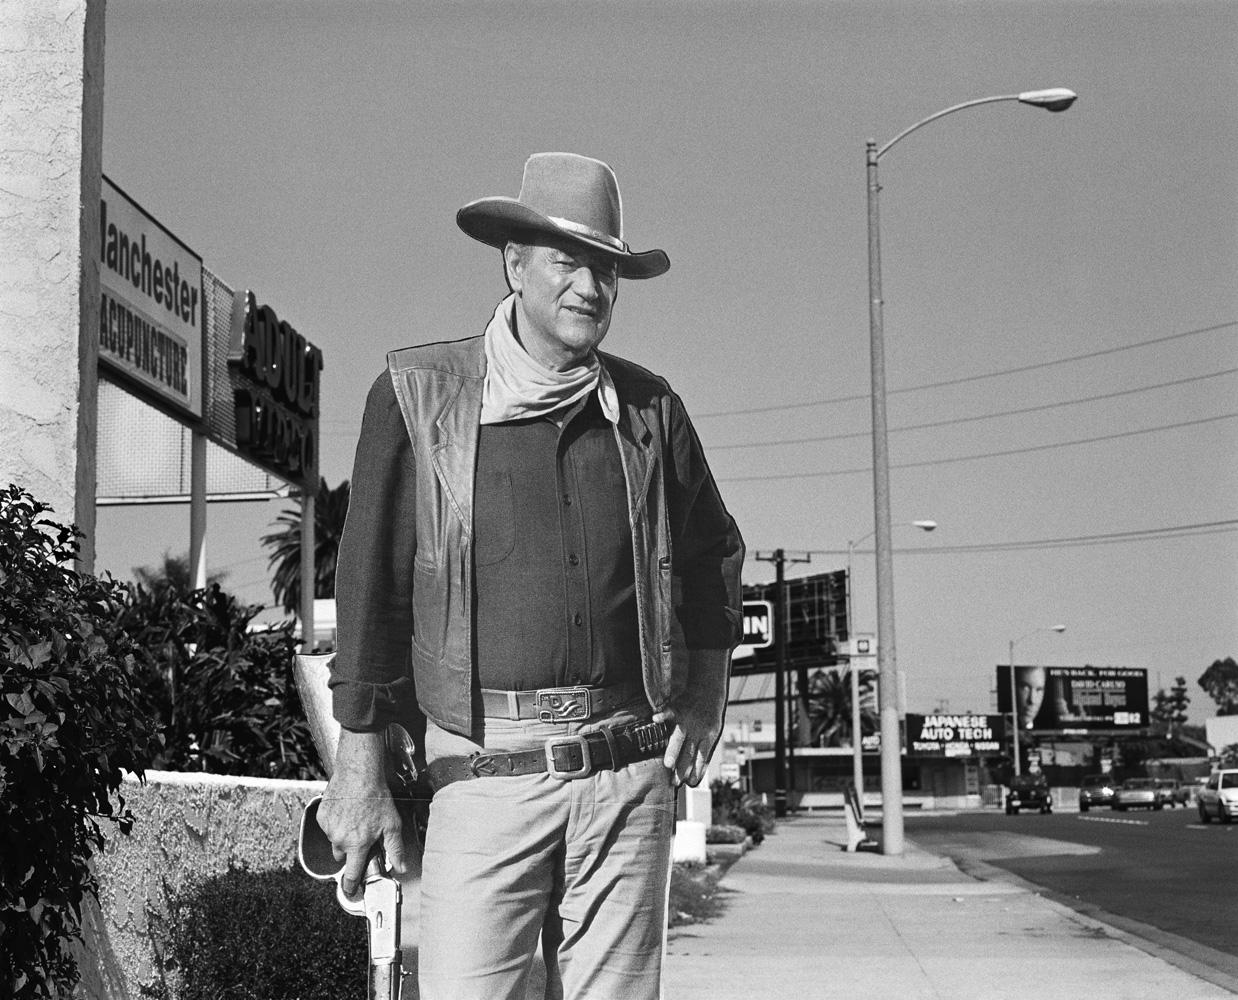 A John Wayne cut-out sign outside a firing range and gun shop in Las Vegas.